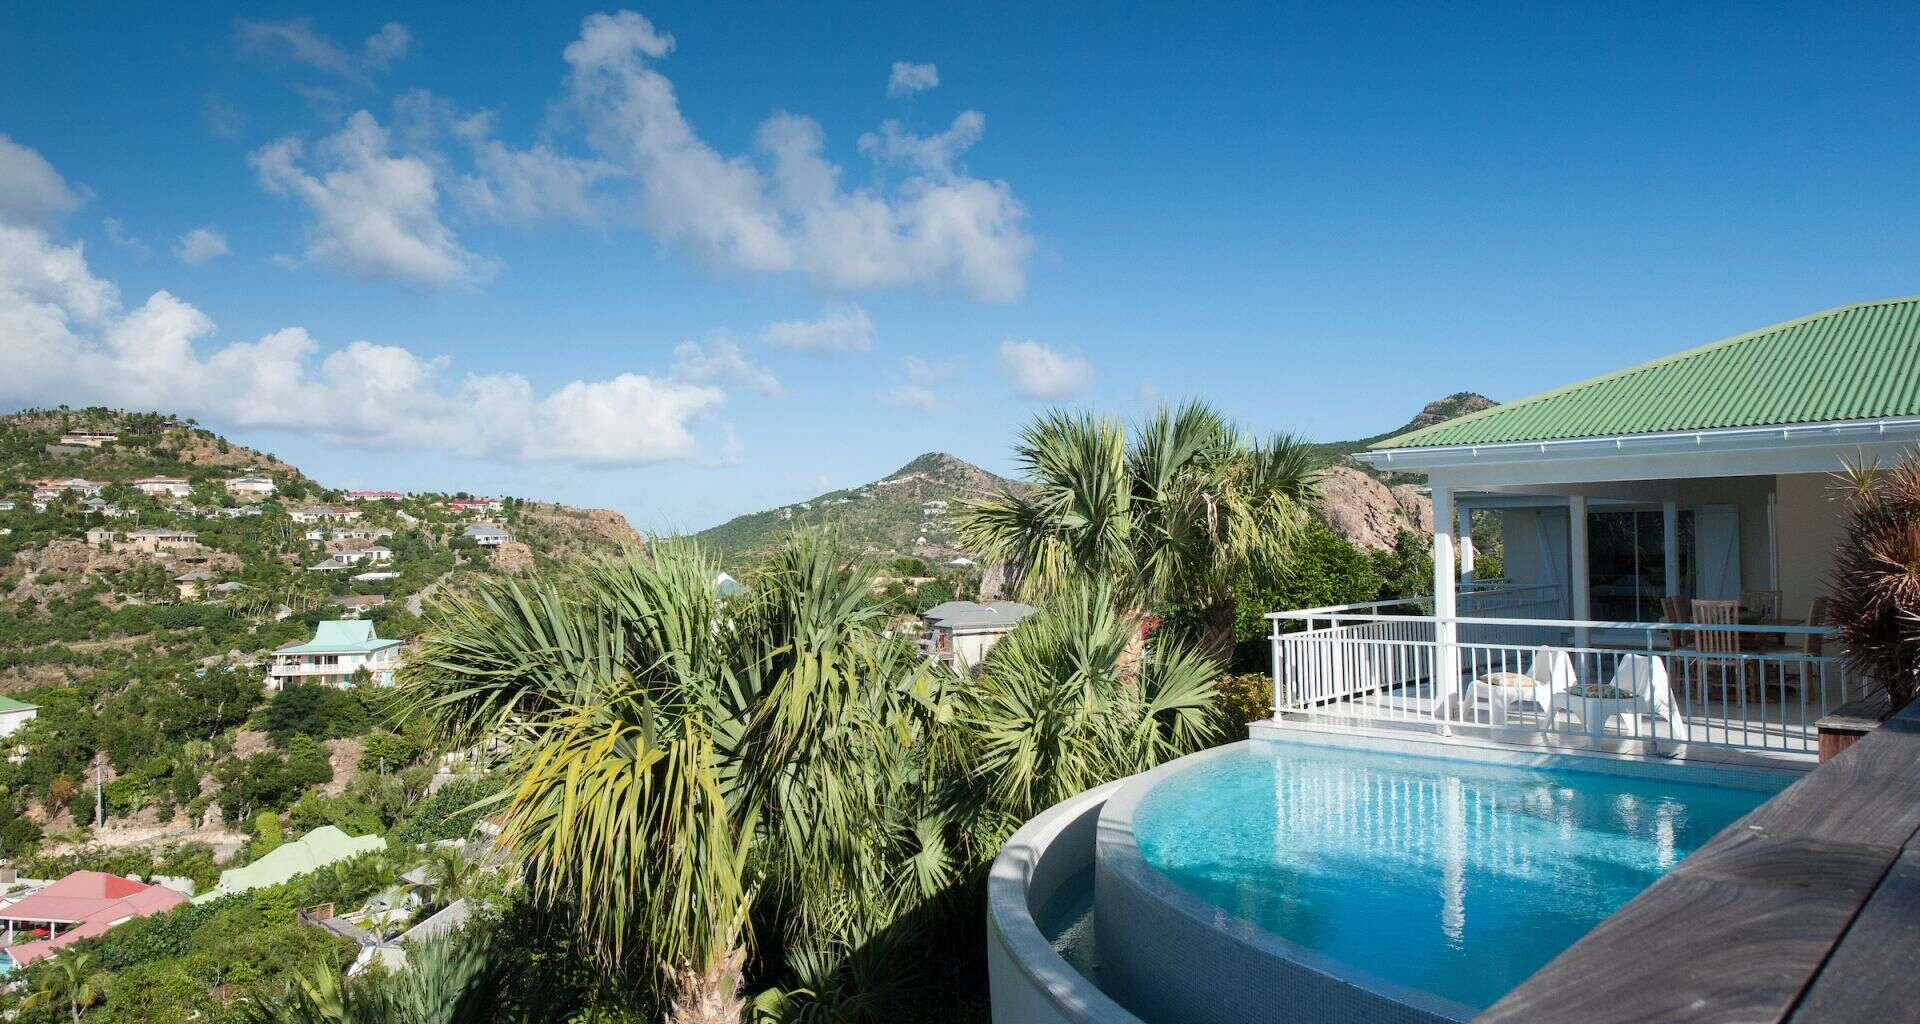 Luxury villa rentals caribbean - St barthelemy - Saint jean - Villa Les Lataniers - Image 1/11